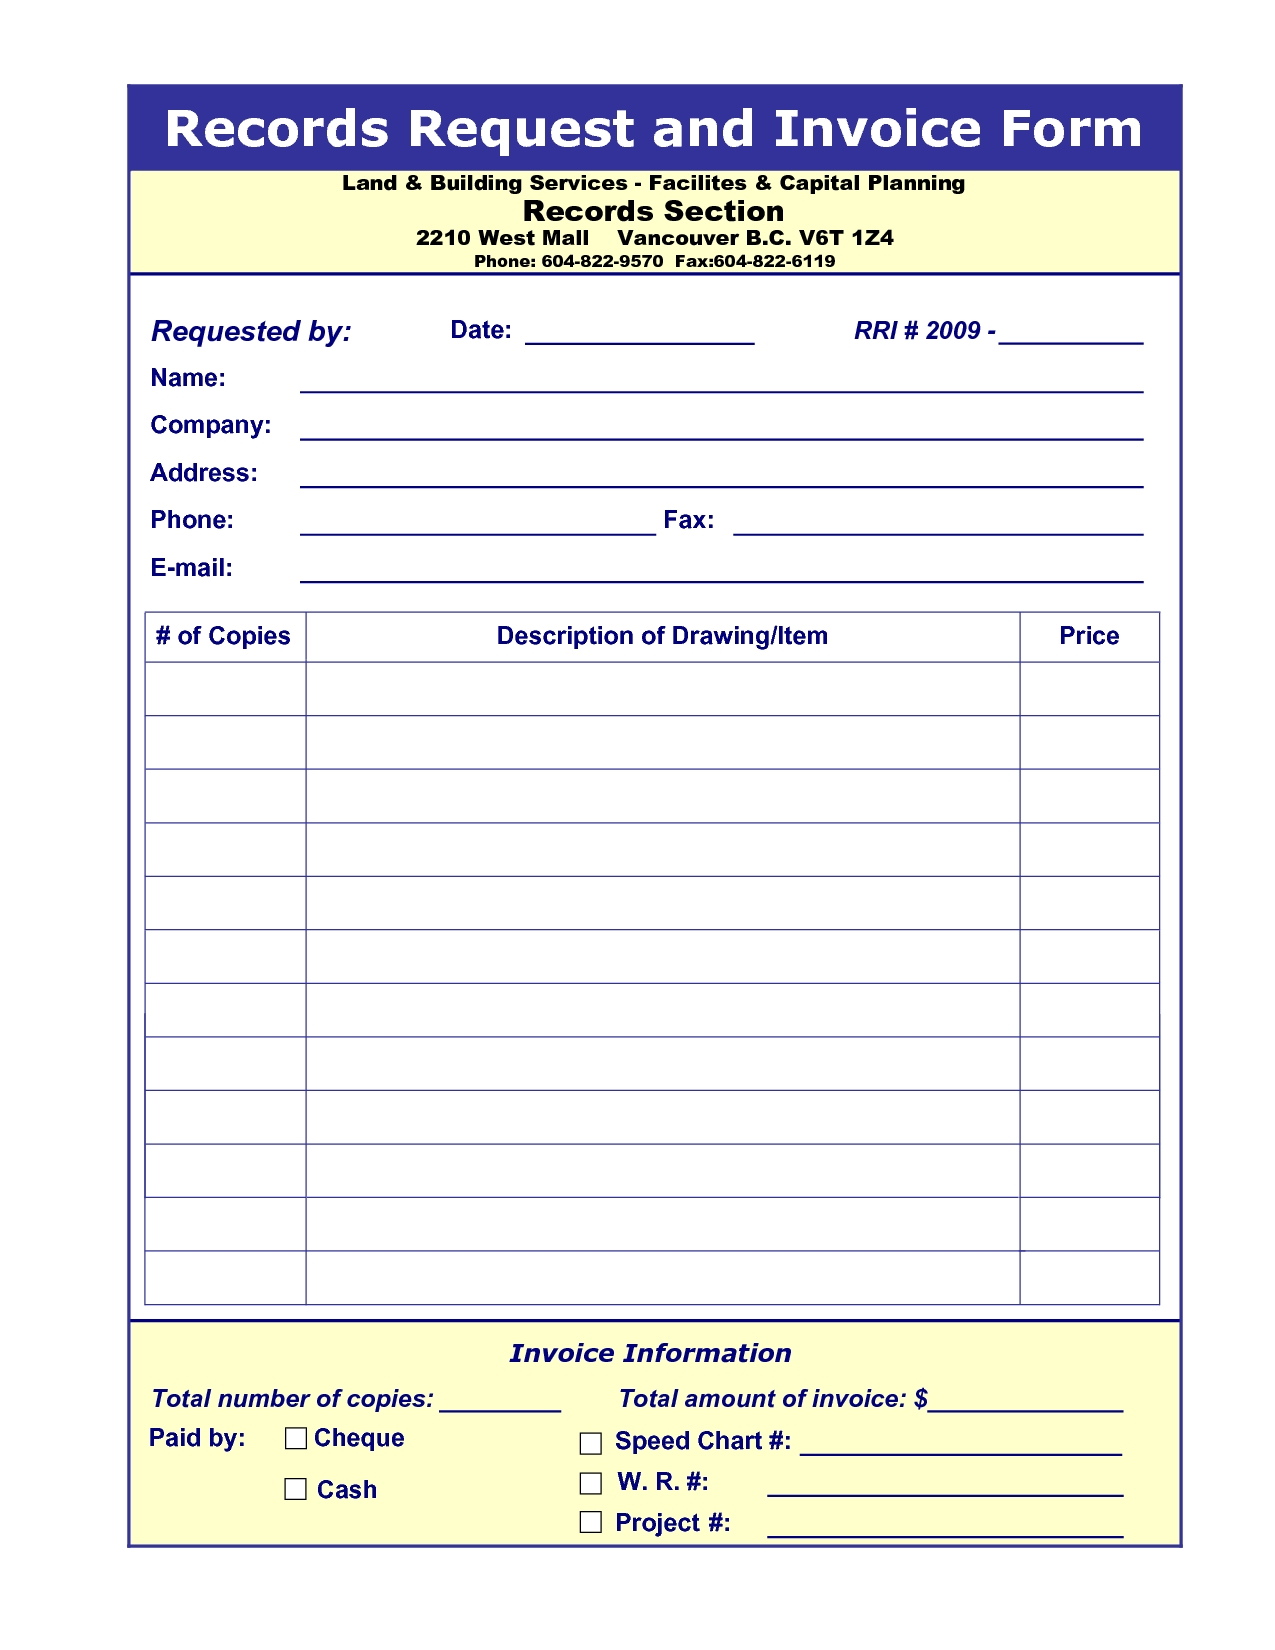 medical records invoice invoice documents imagifyco 1275 X 1650